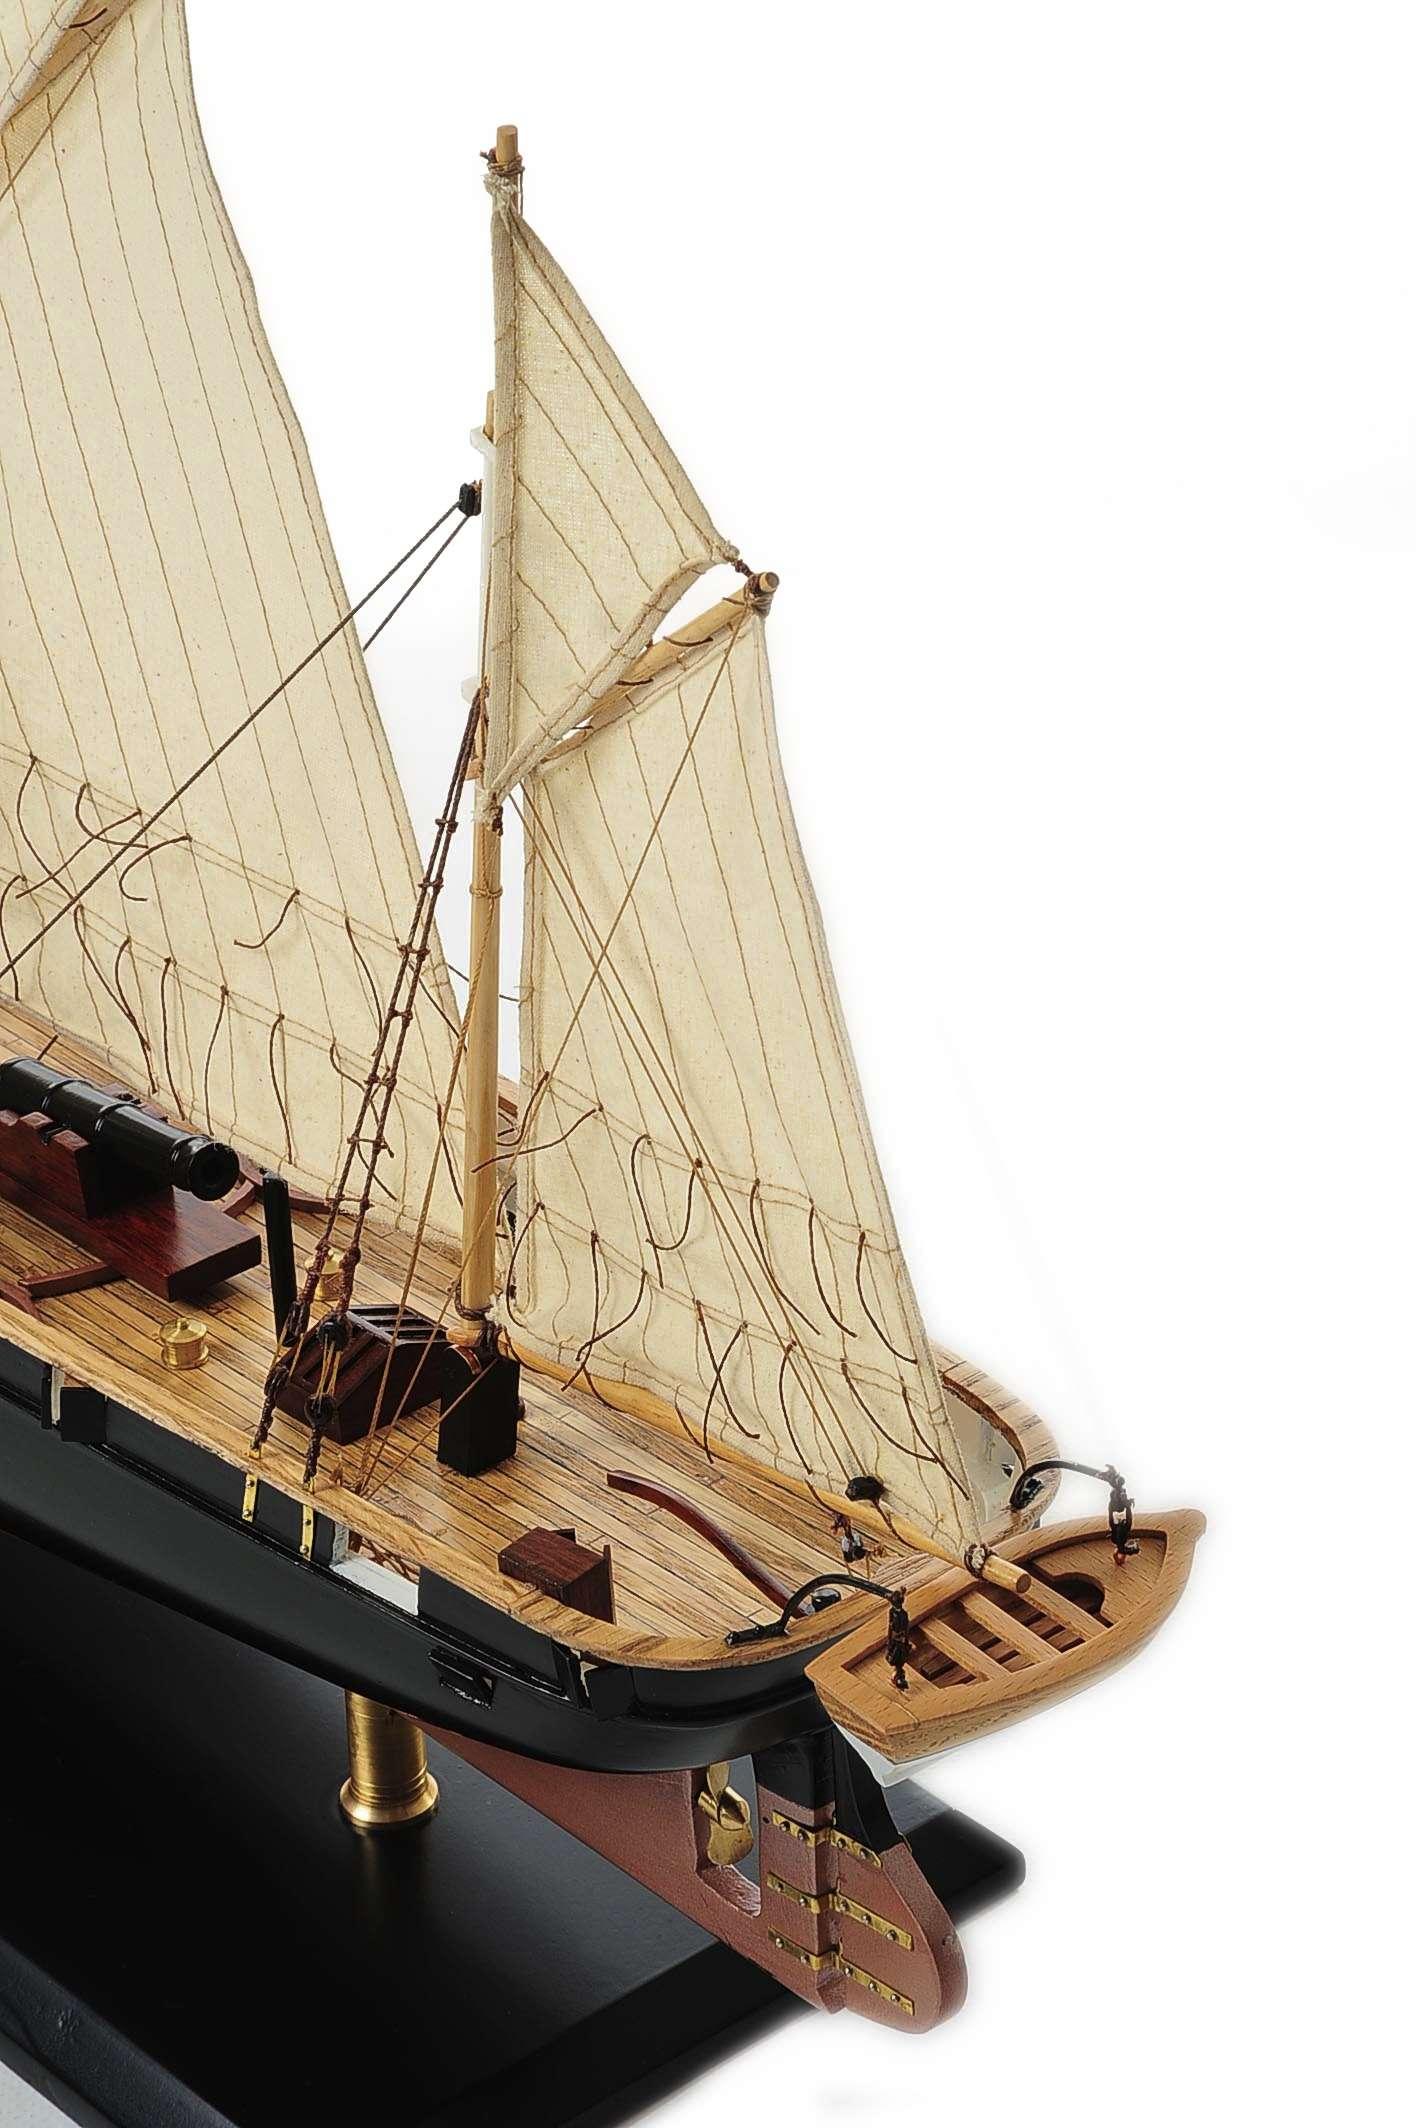 1428-4673-HMS-Cockchafer-2-Model-Boat